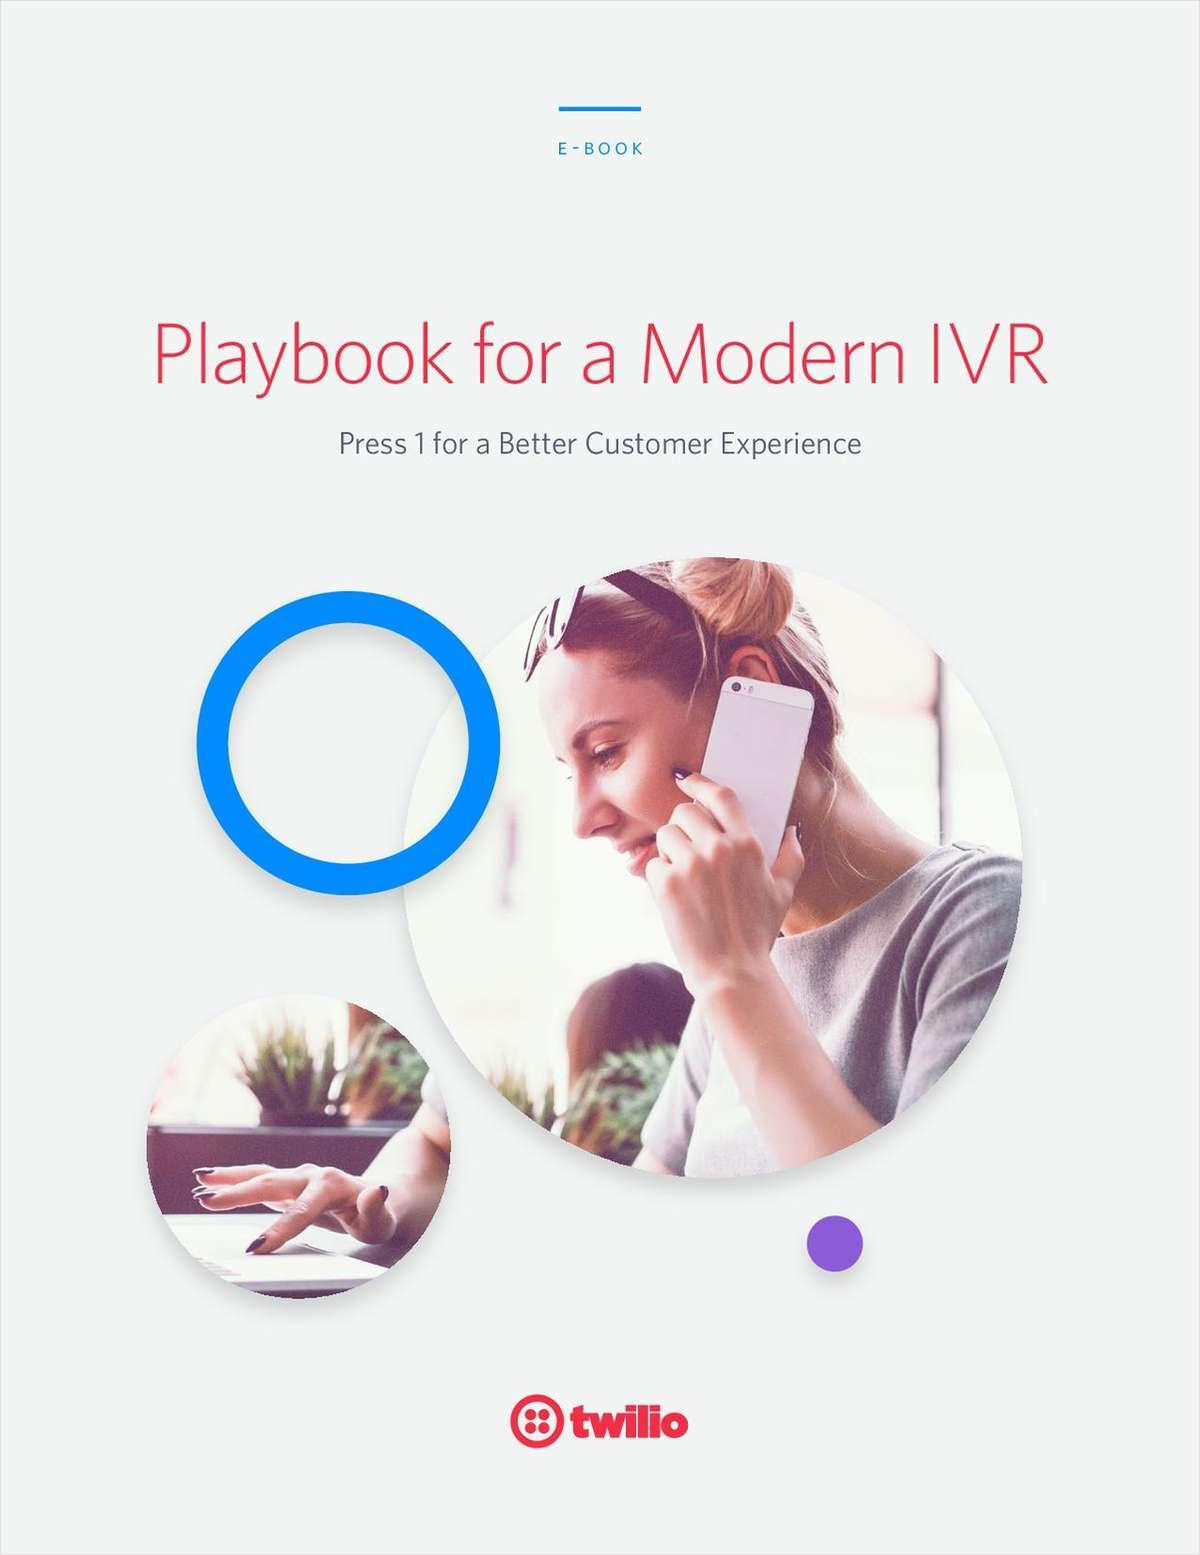 Playbook for a Modern IVR